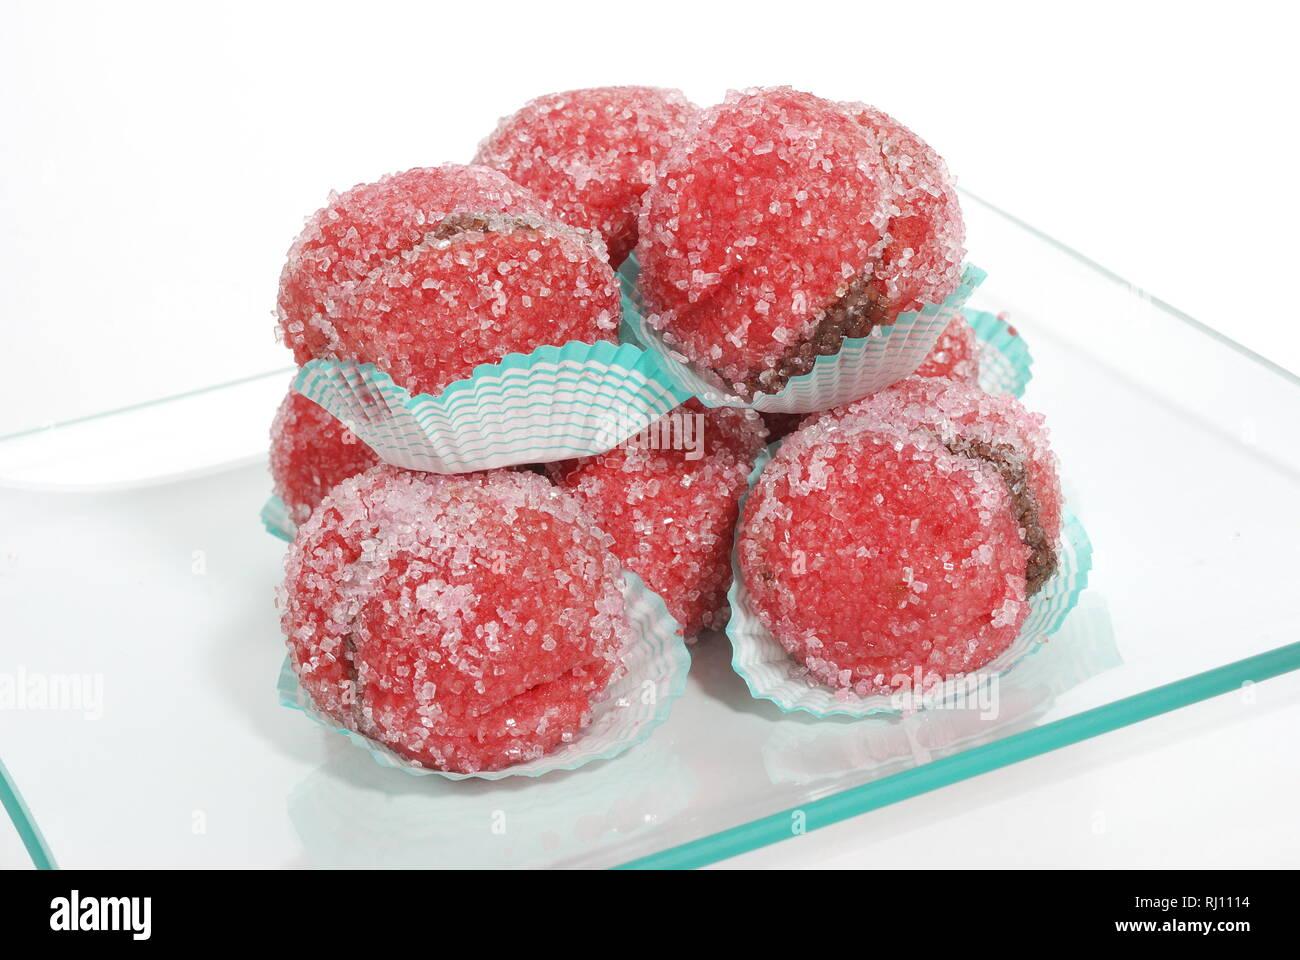 Cakes with chocolate cream and Christmas sugar Stock Photo